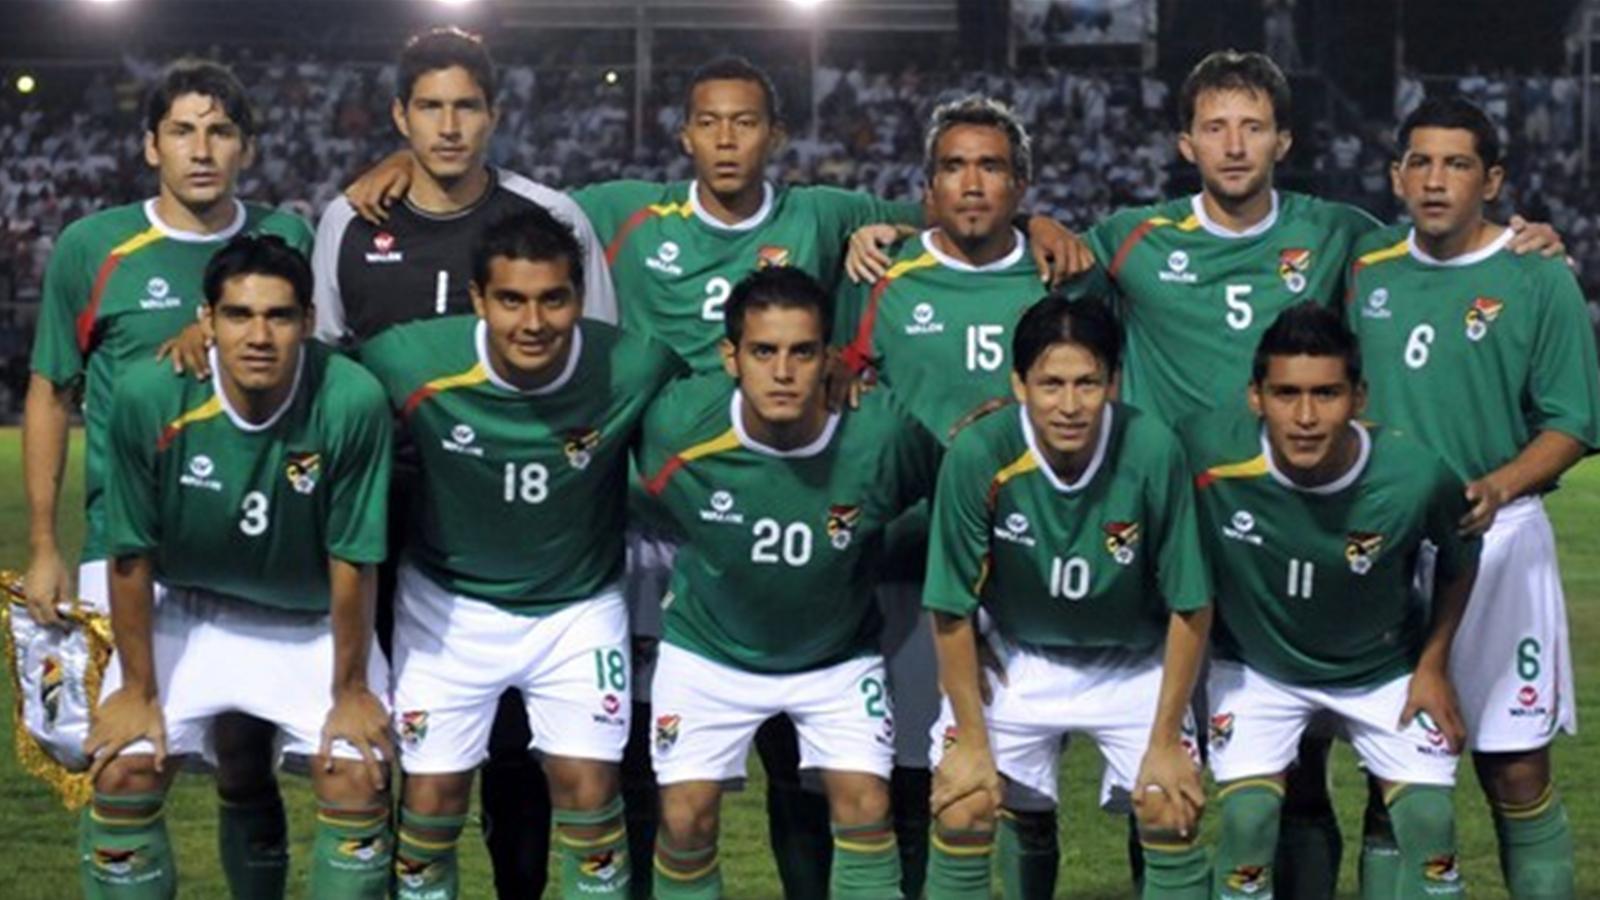 9cb6e32a9 Bolivia matches threatened - World Cup 2010 - Football - Eurosport